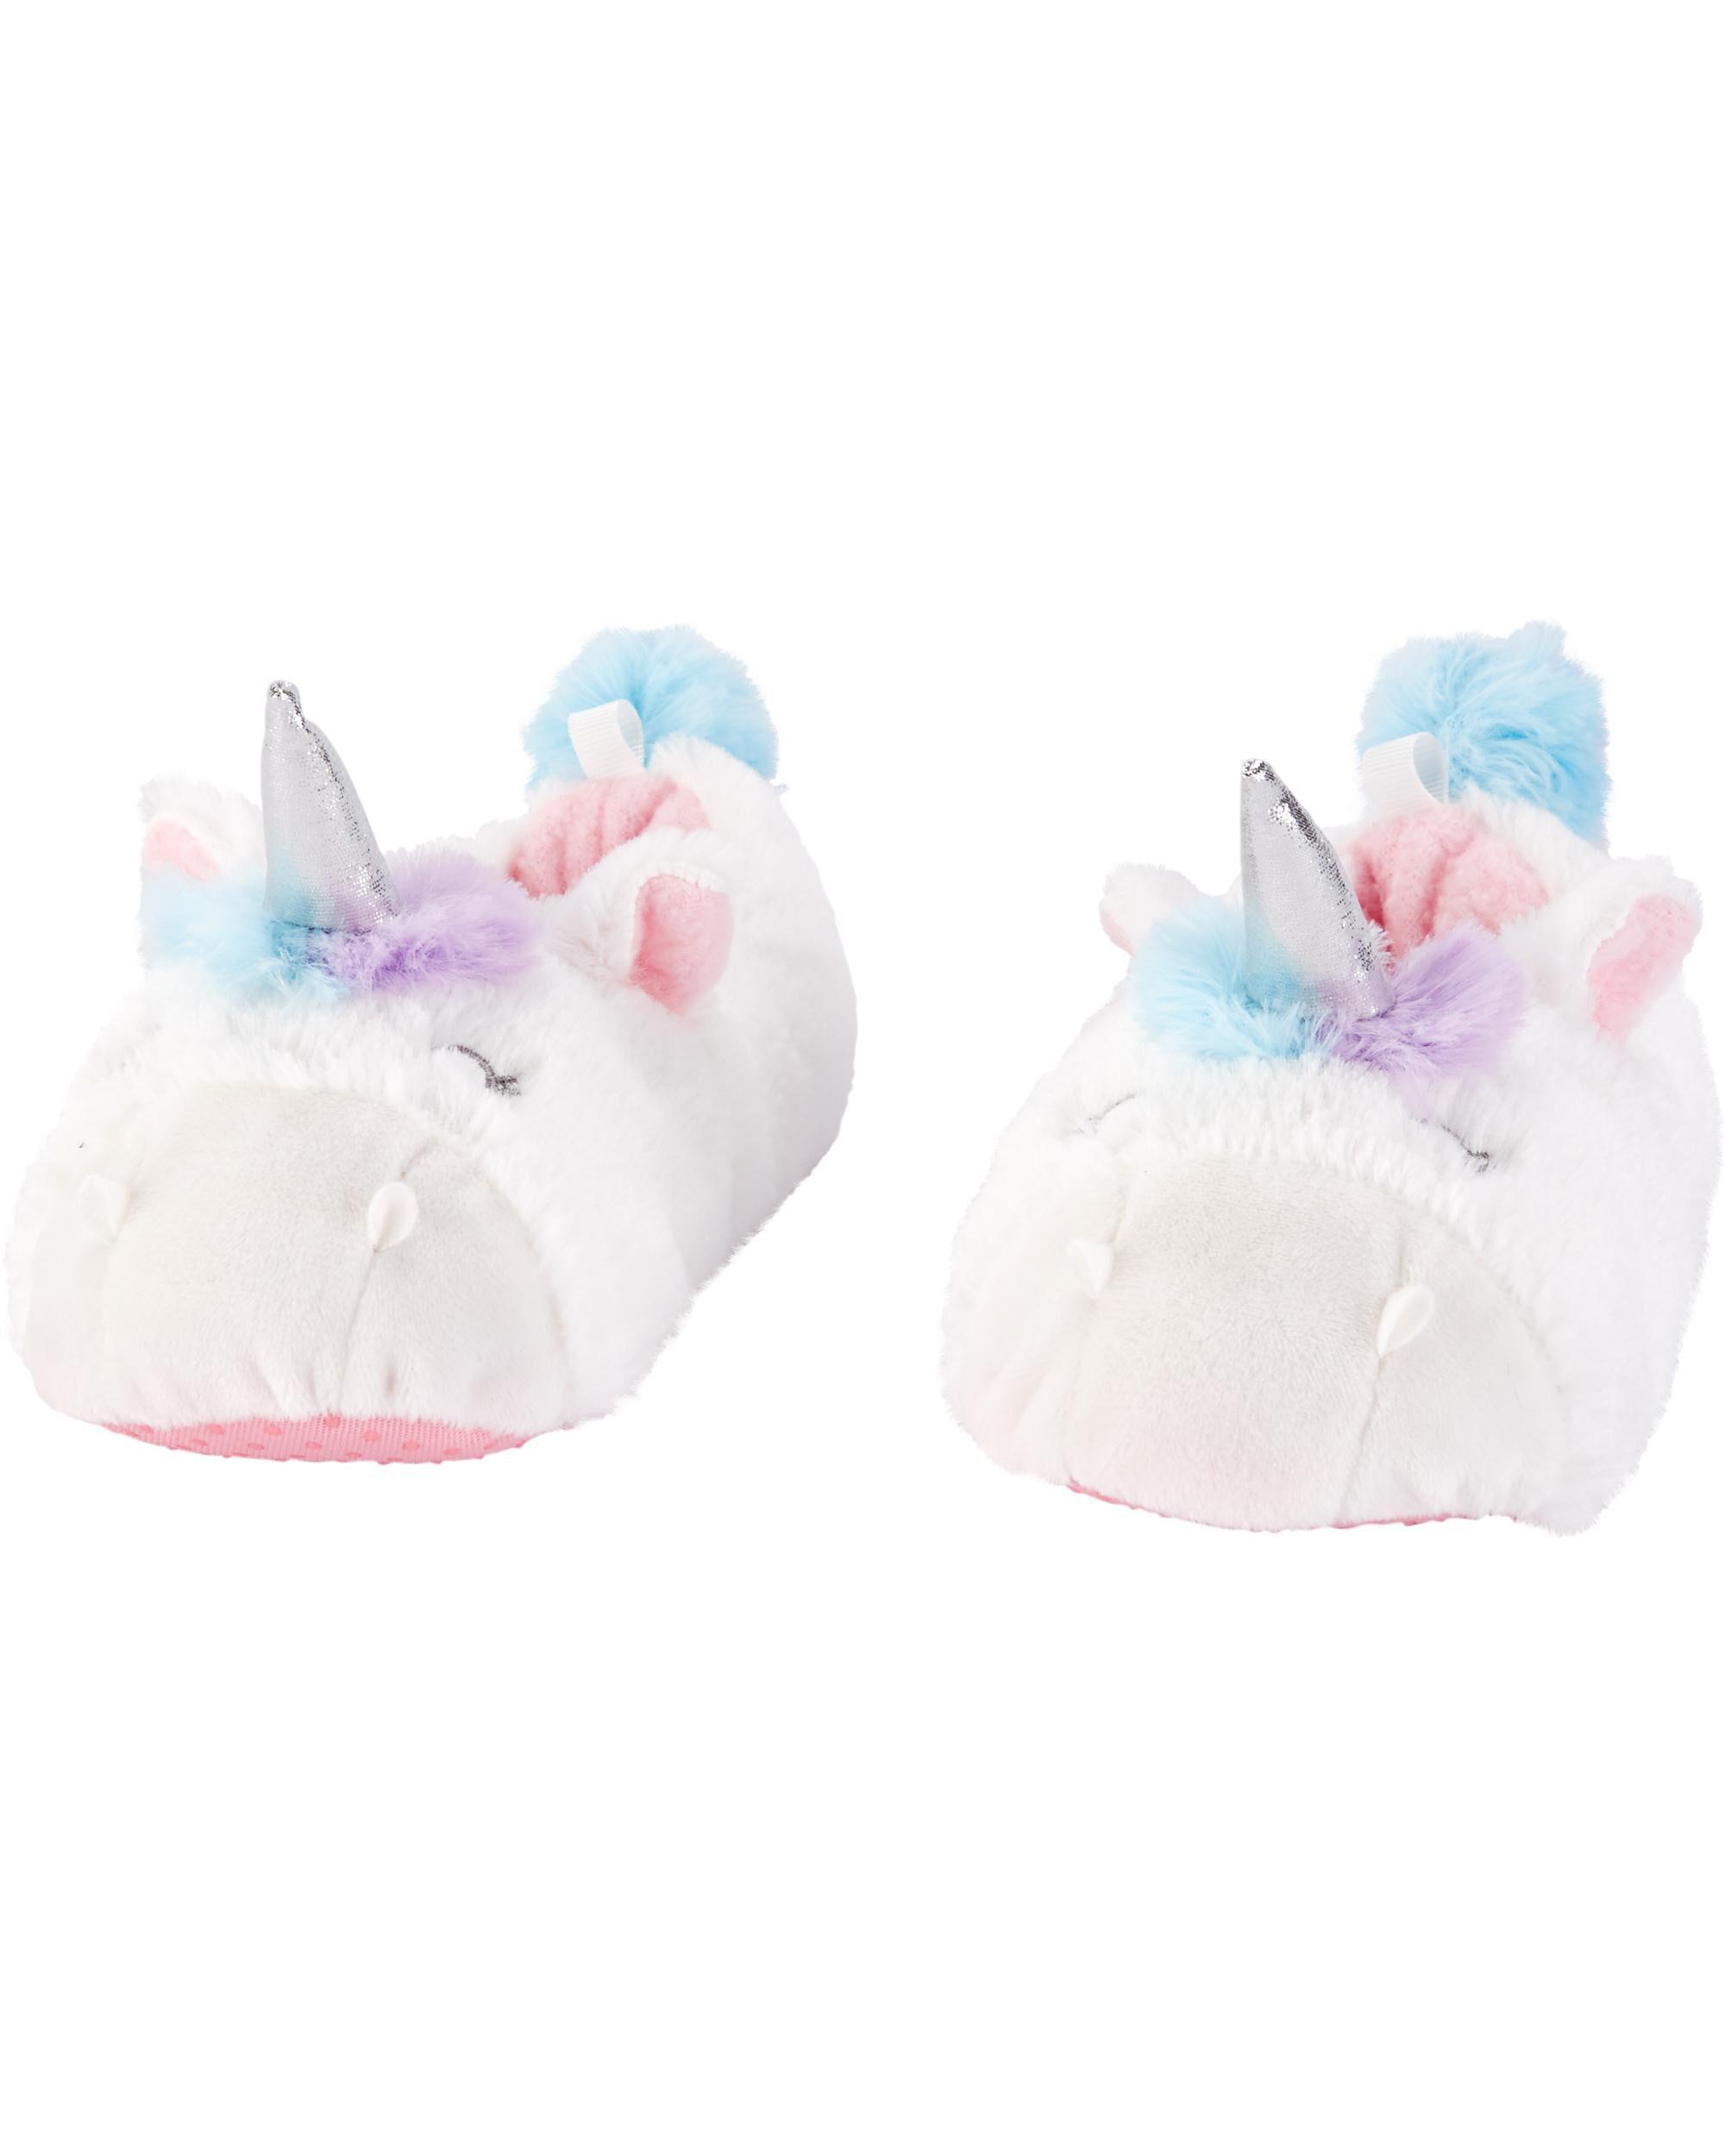 Carter's Unicorn Slippers | carters.com